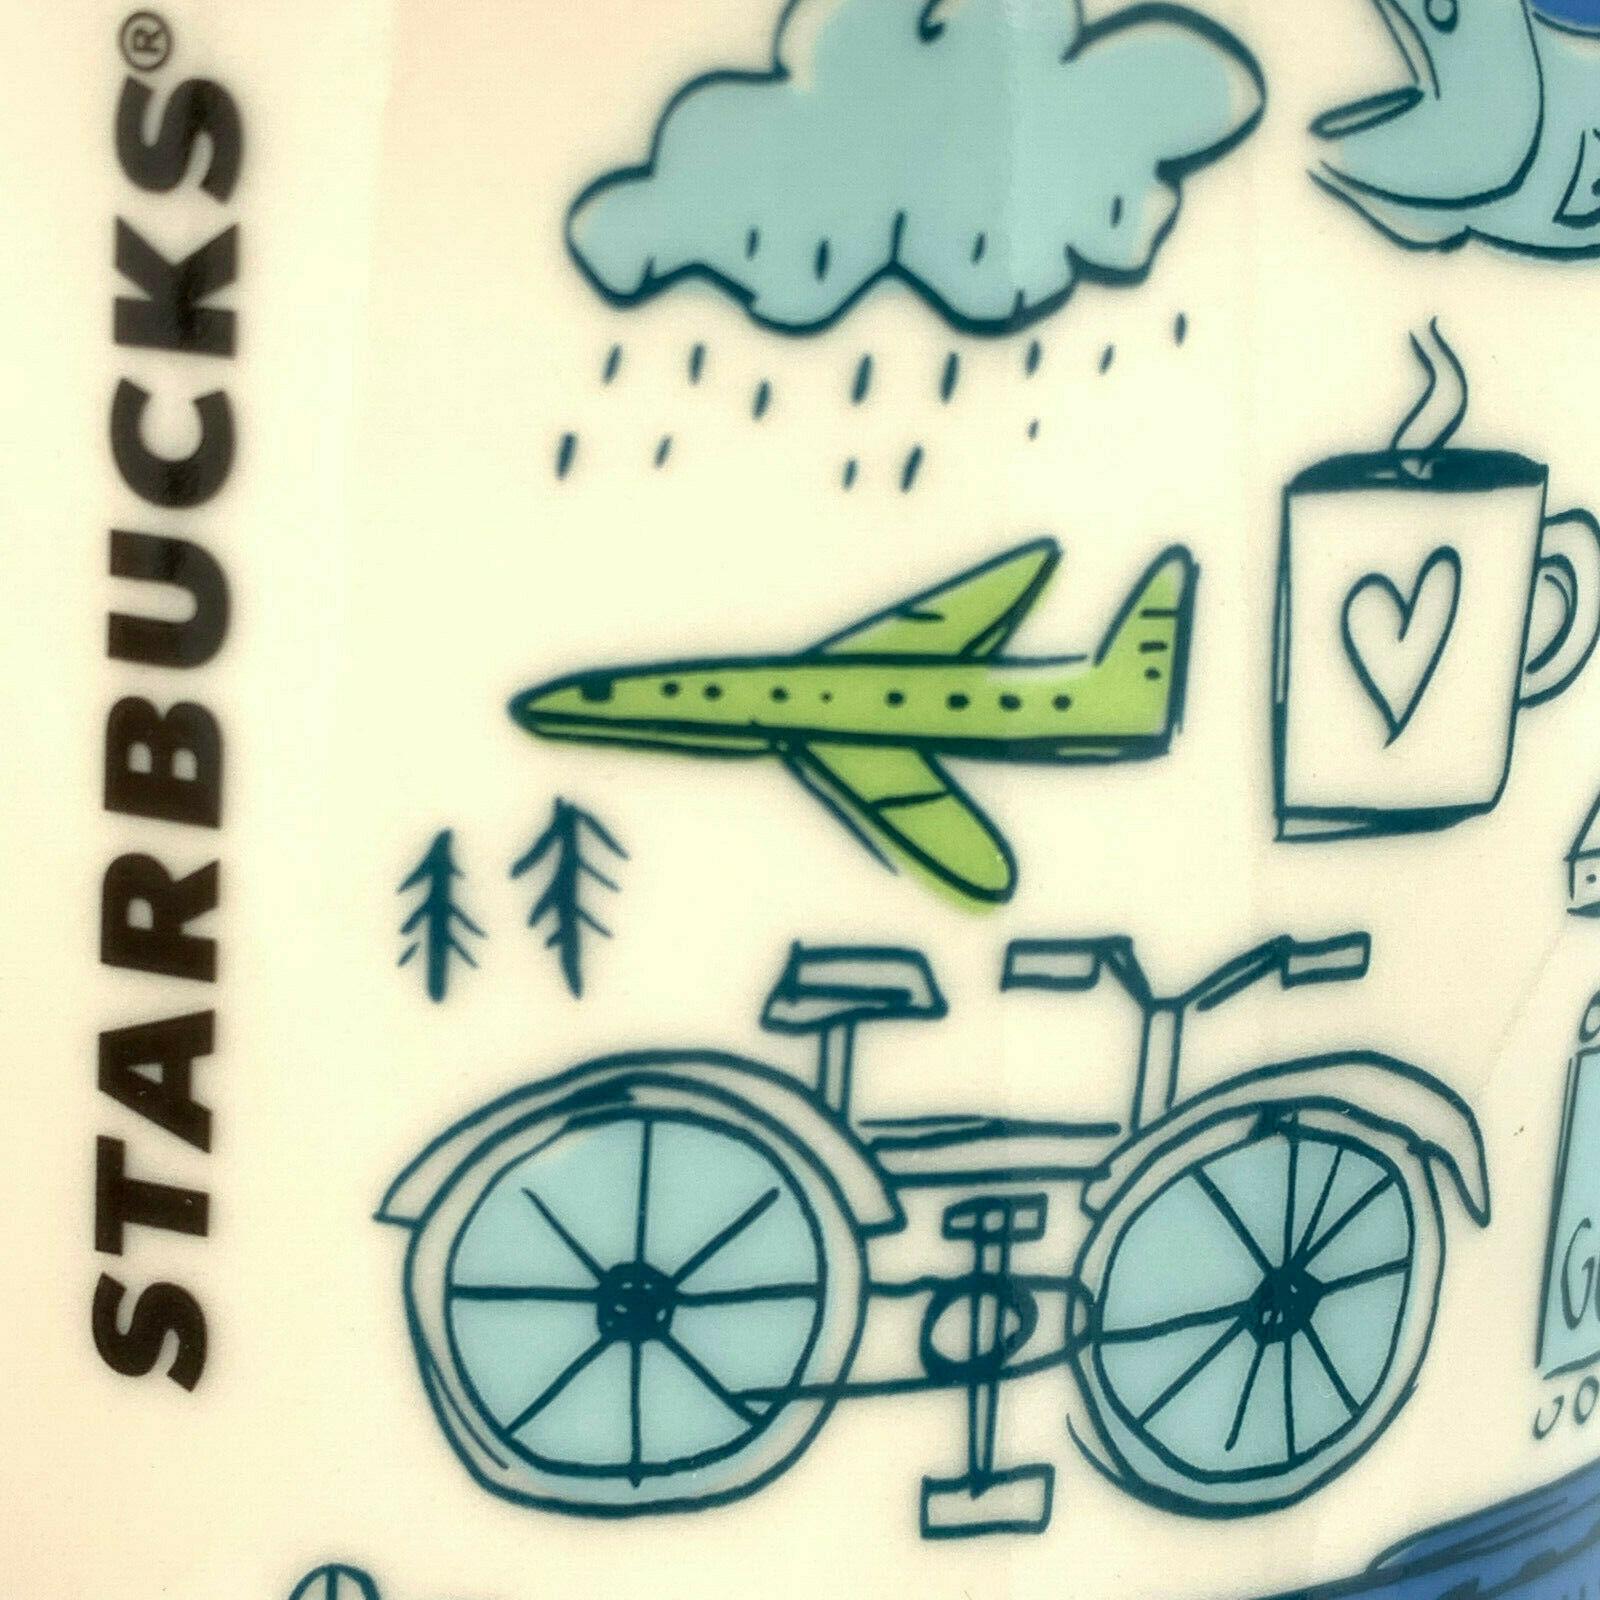 Starbucks Coffee Ceramic Mug Cup USA World Collection Coffee Tea Hot 14 oz Gift image 5